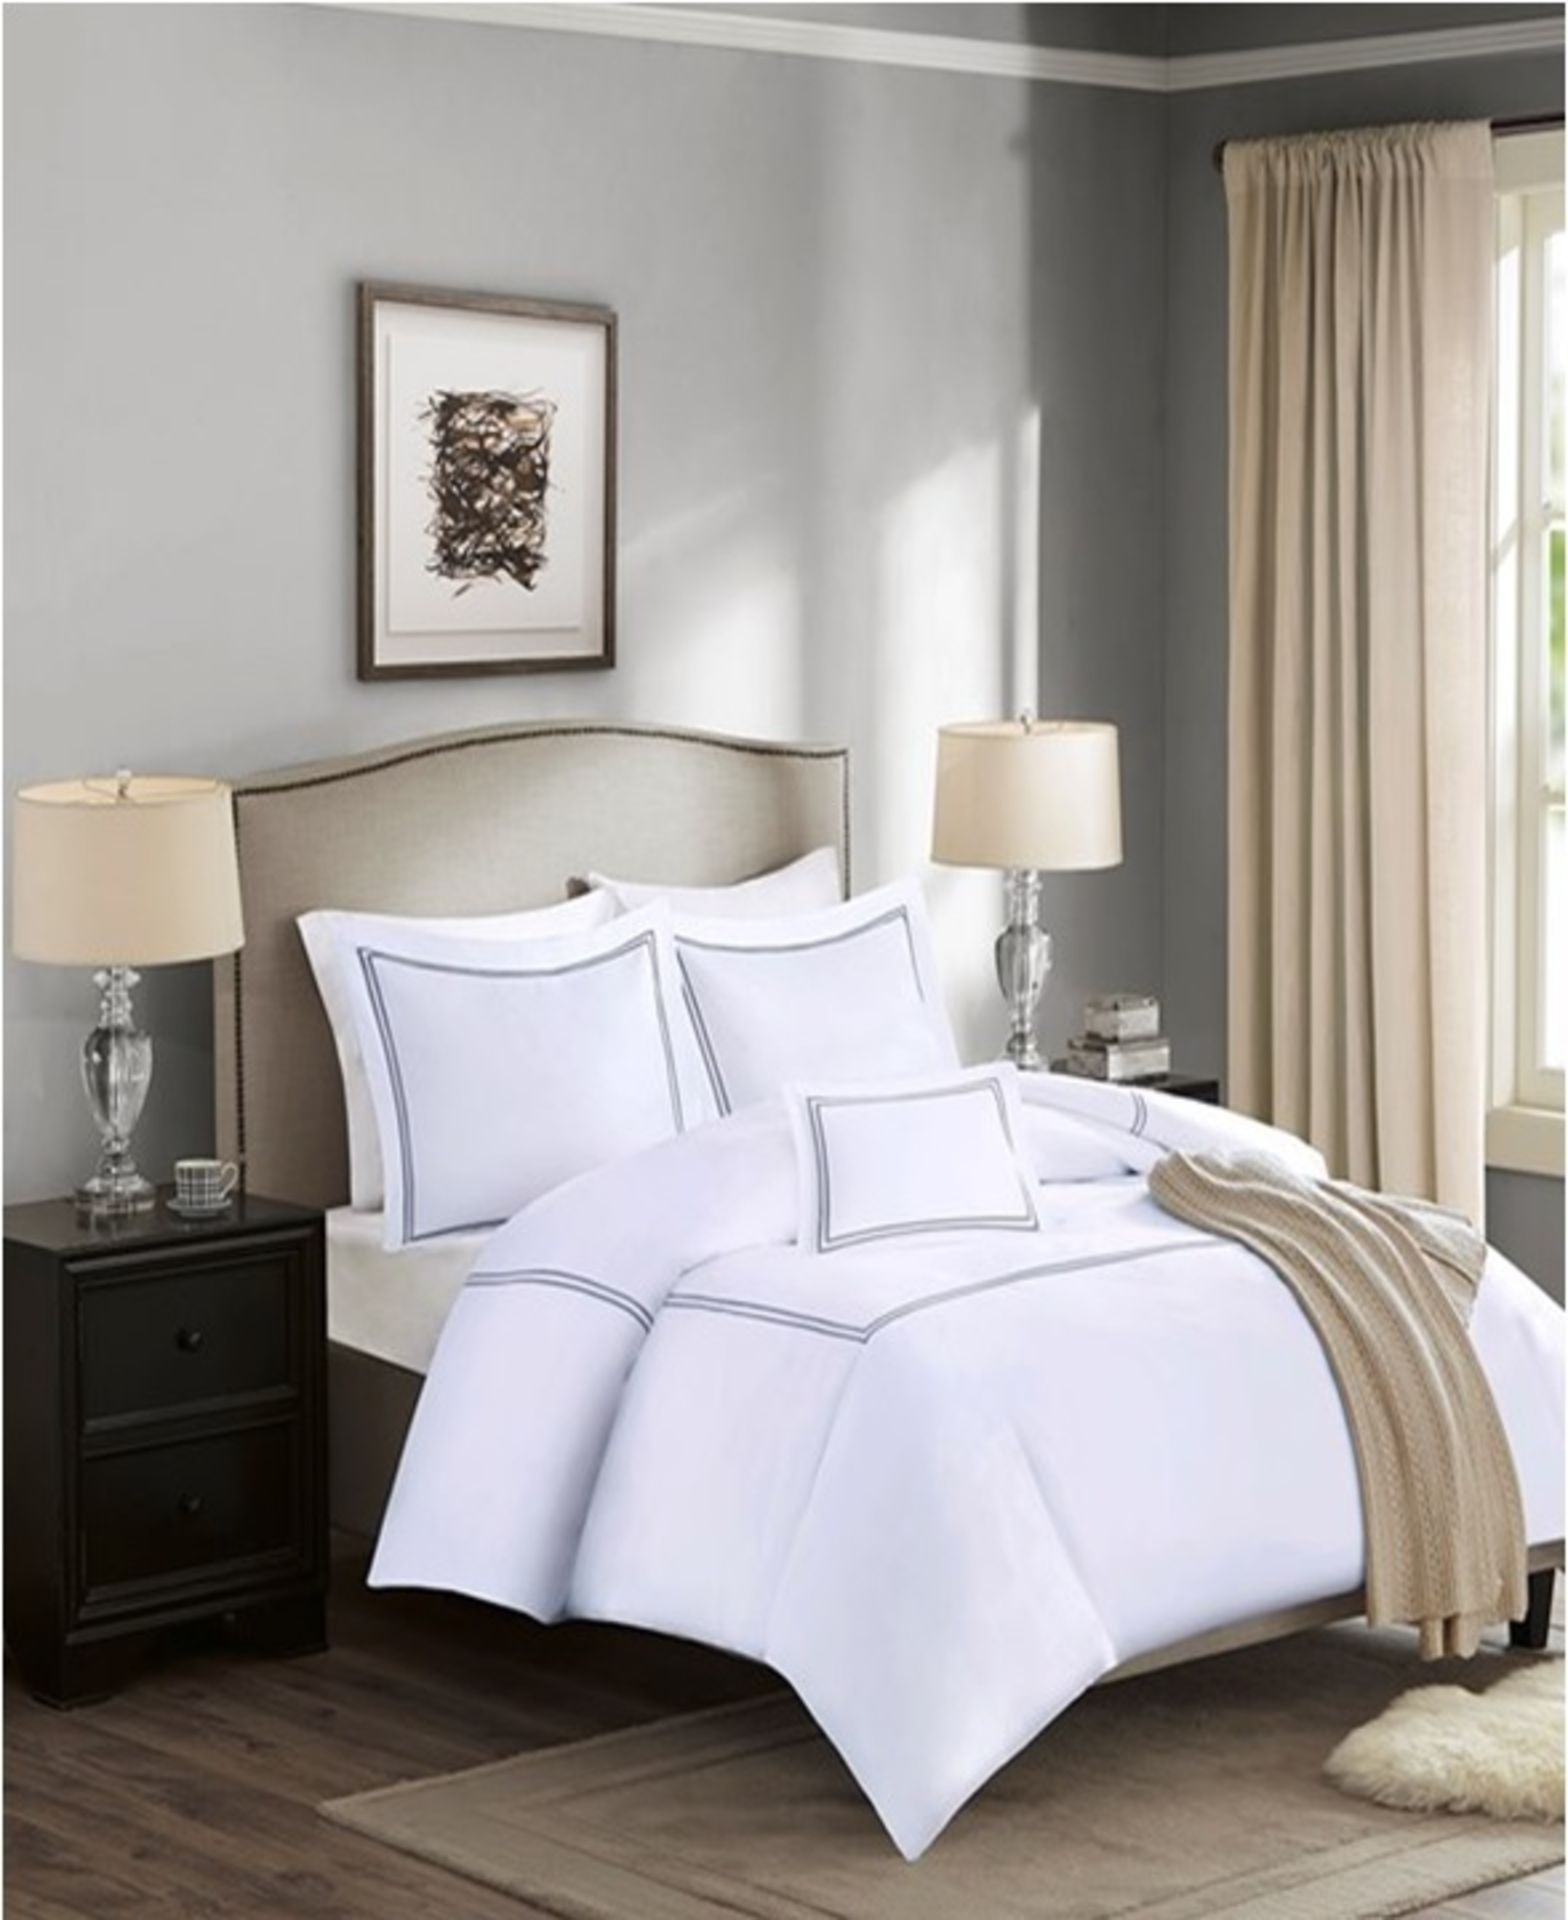 Lot 151 - 1 x Madison Park Luxury Collection Double Duvet Set White - Product Code MP12-0198UK (Brand New -